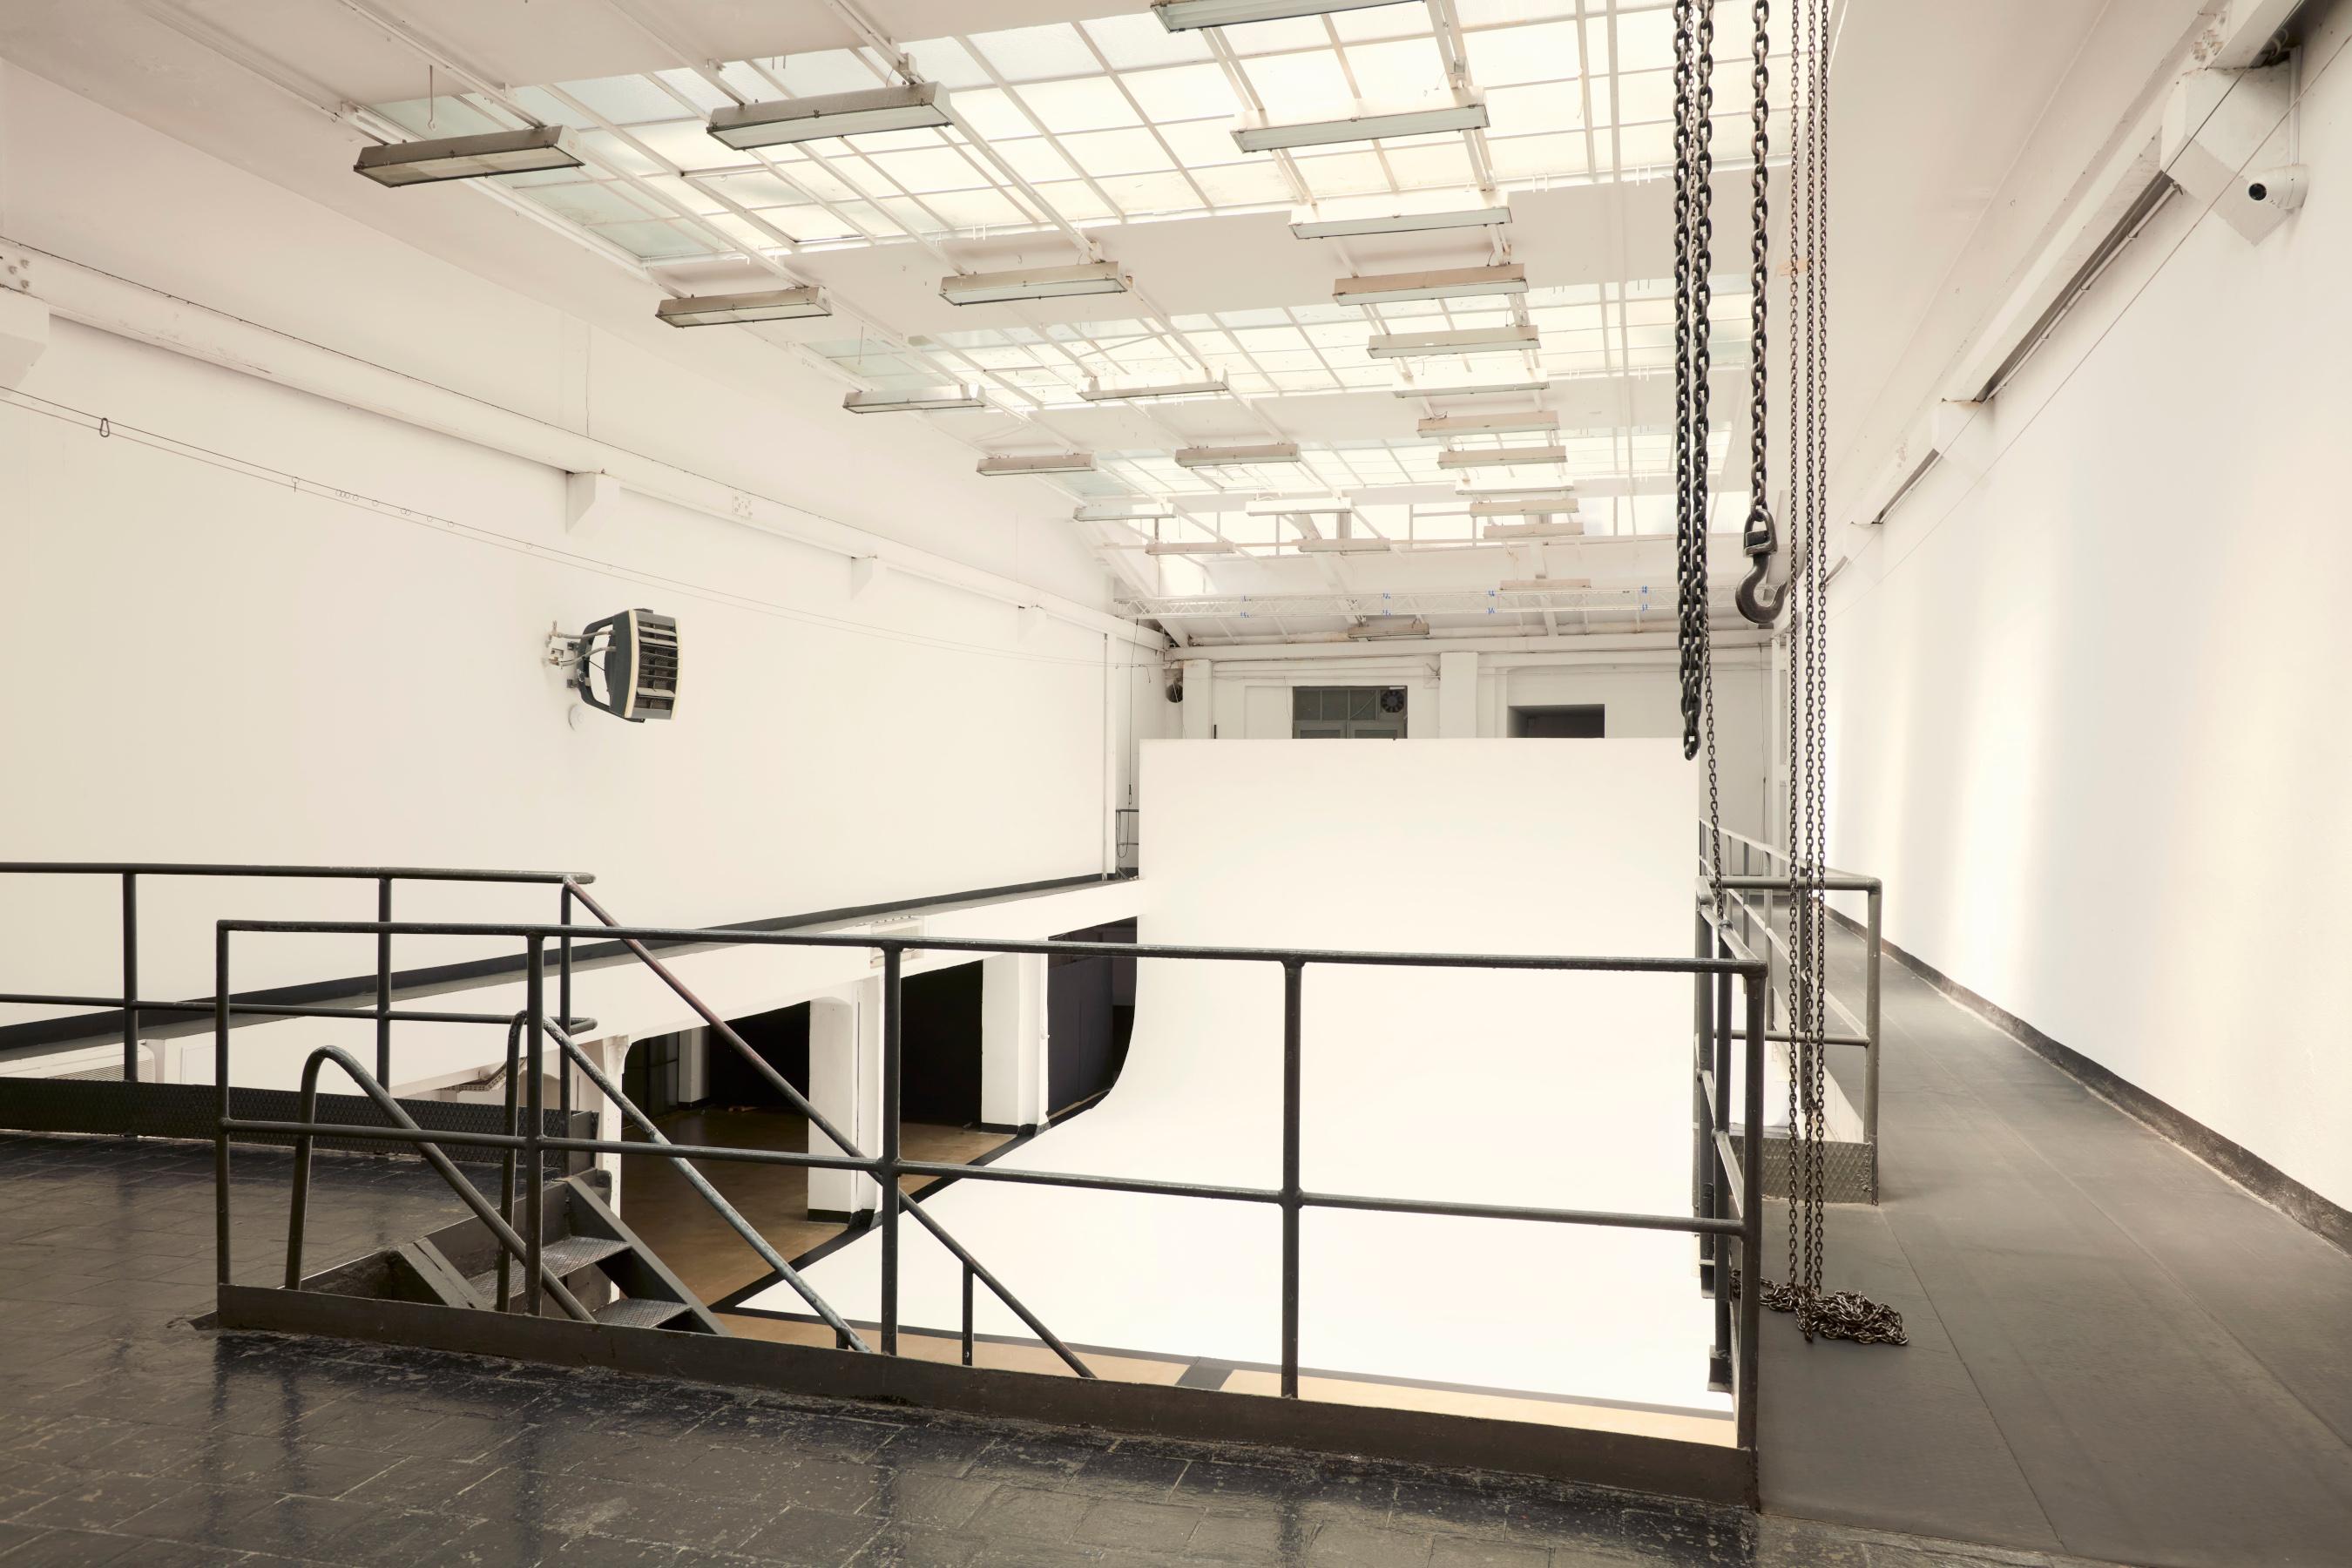 Over 2000m² of open floor surface